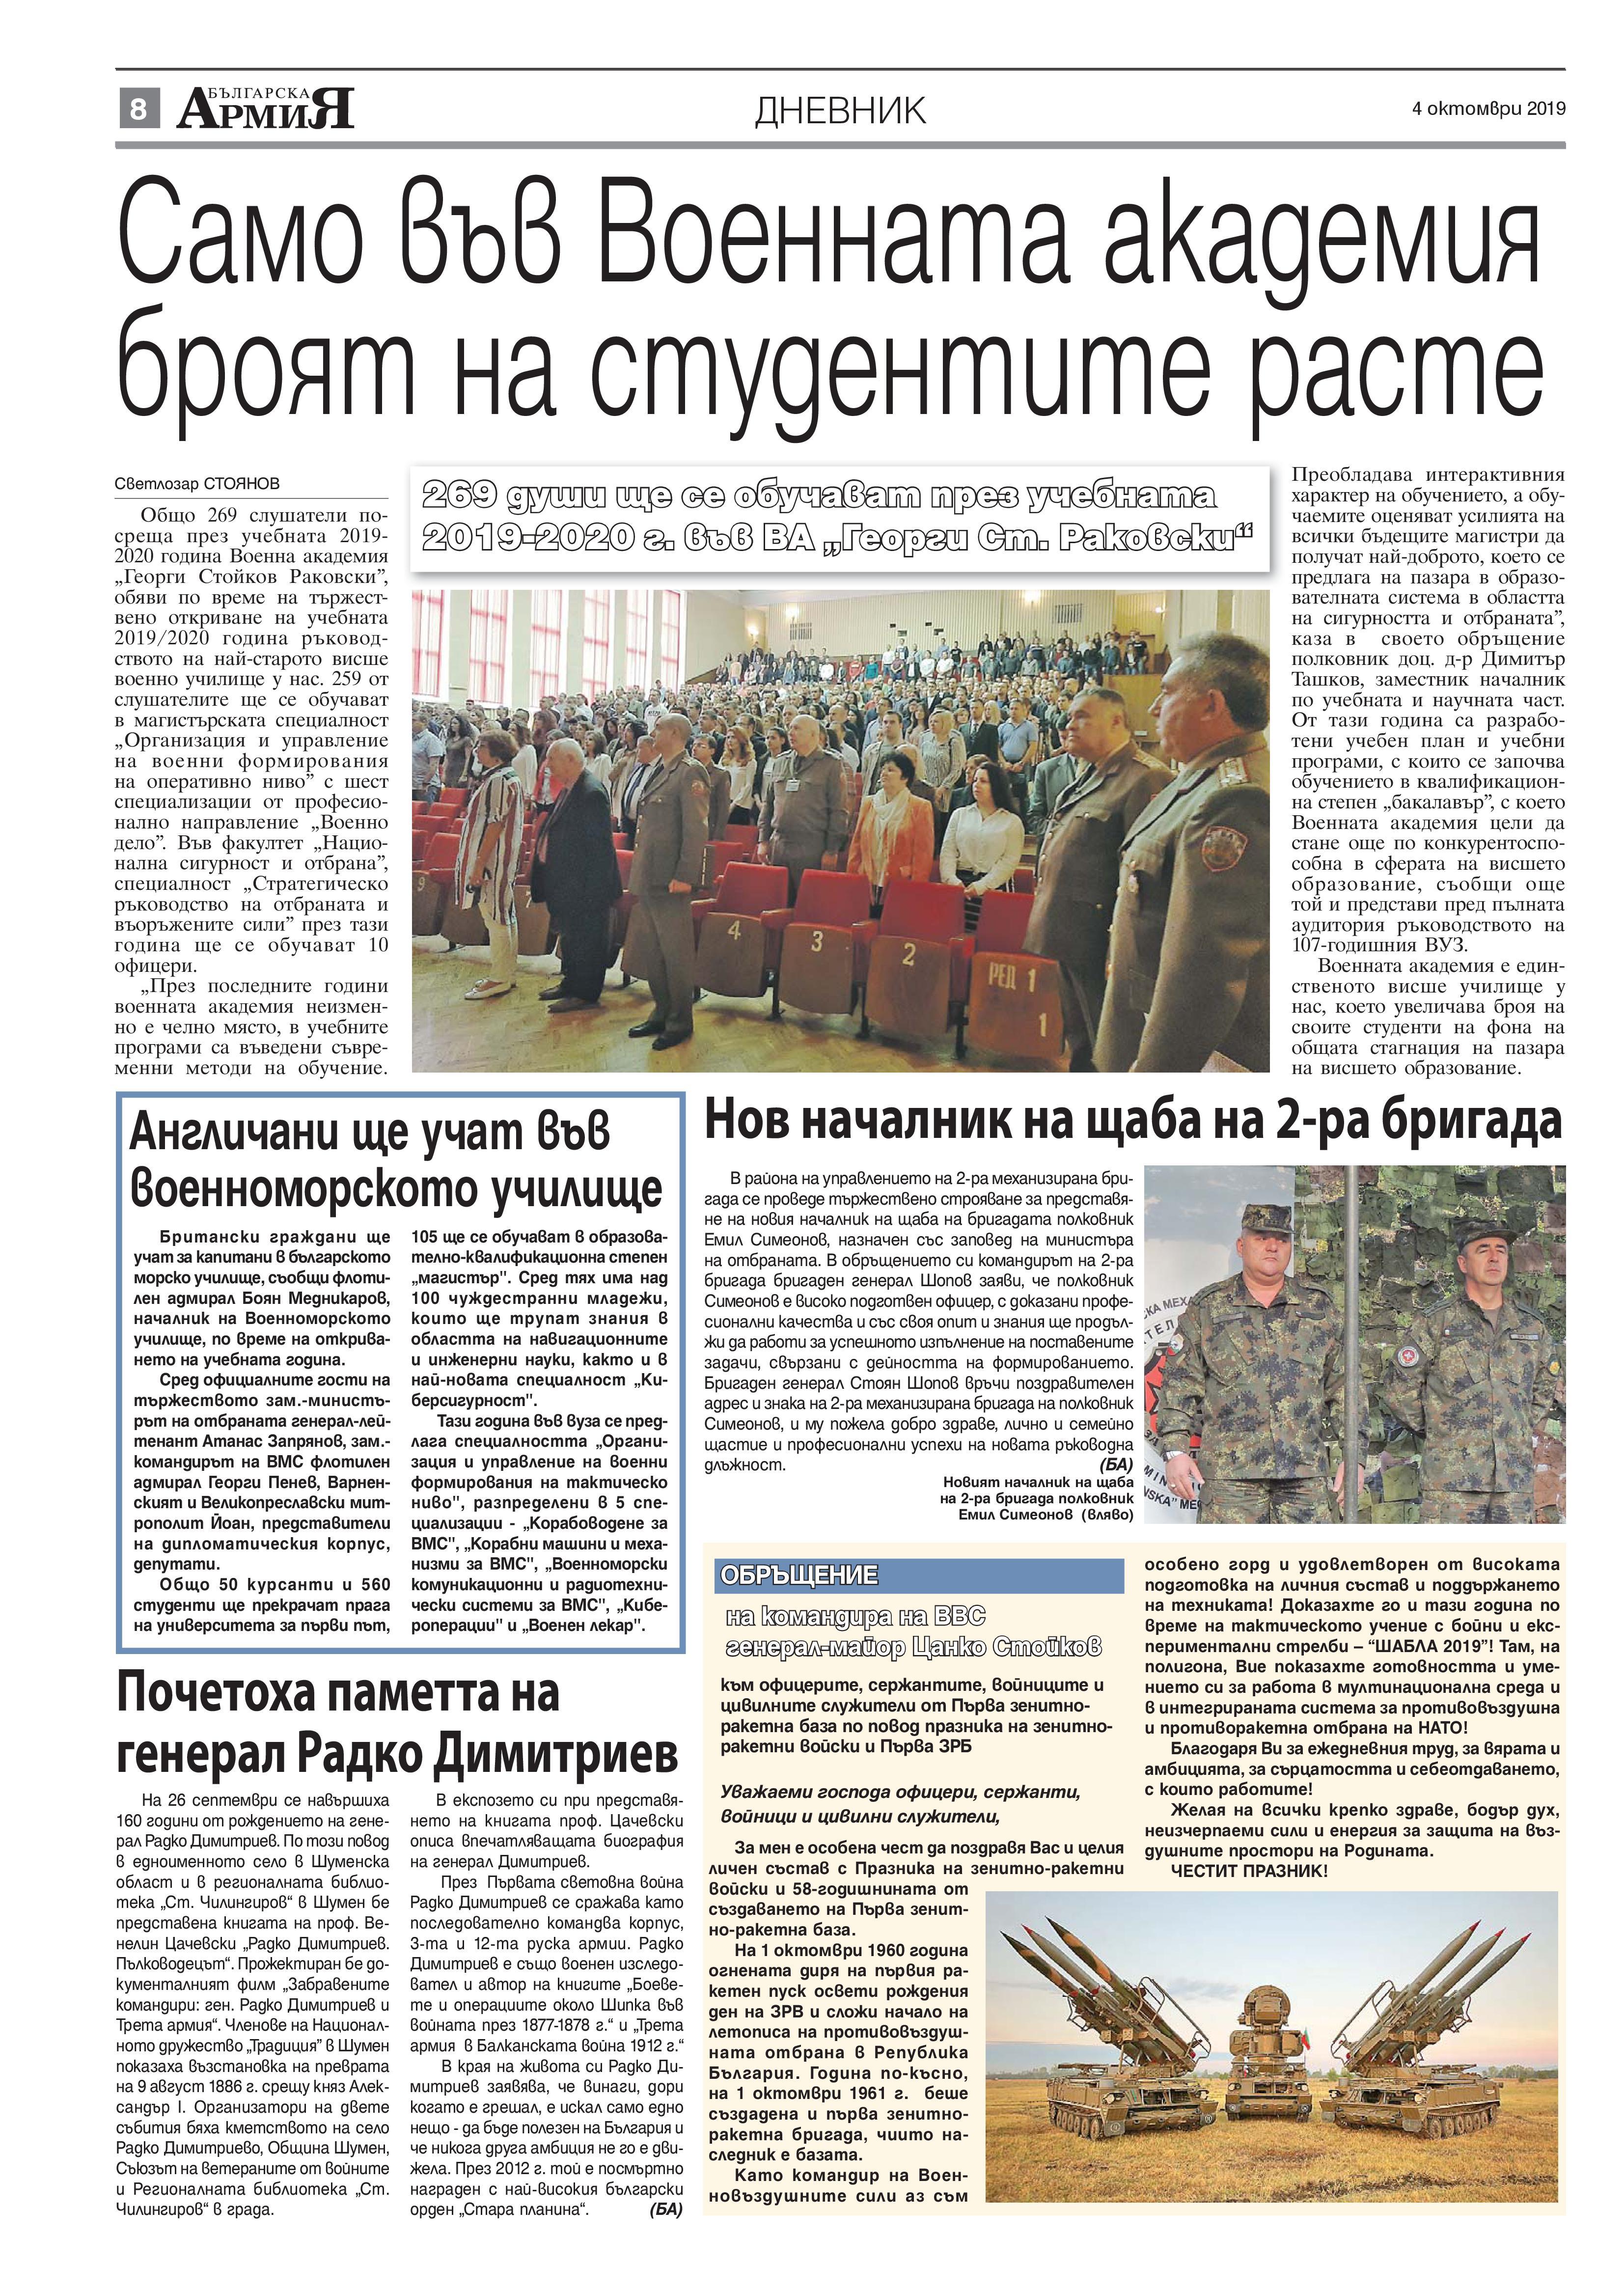 https://armymedia.bg/wp-content/uploads/2015/06/08-32.jpg